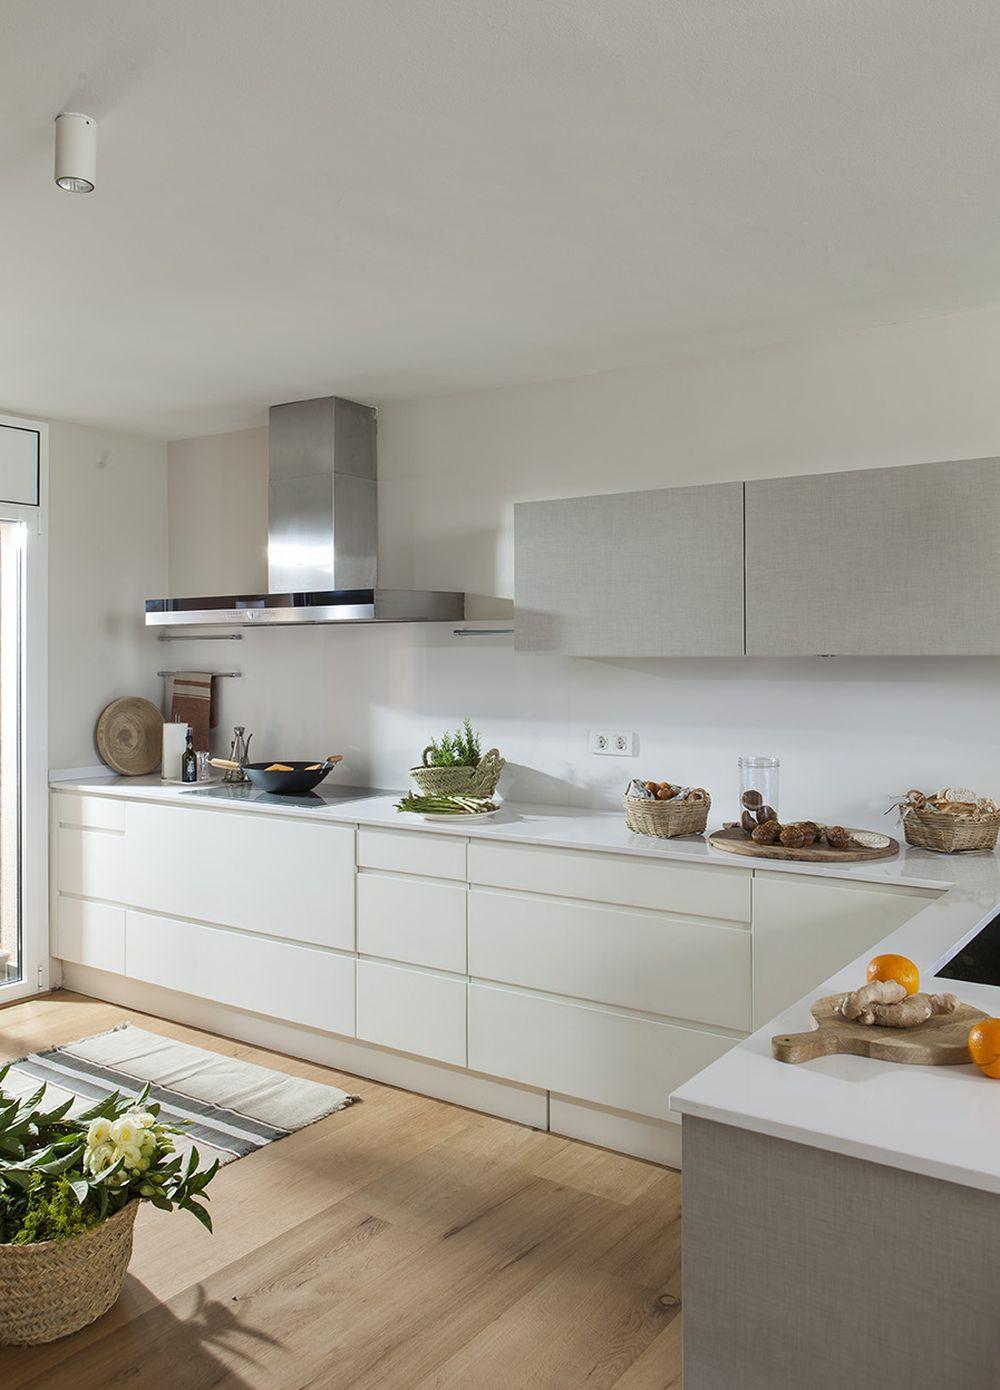 adelaparvu.com despre casa cu gradina, accente marine, designer Jeanette Dresing, Foto Feran Freixa (13)